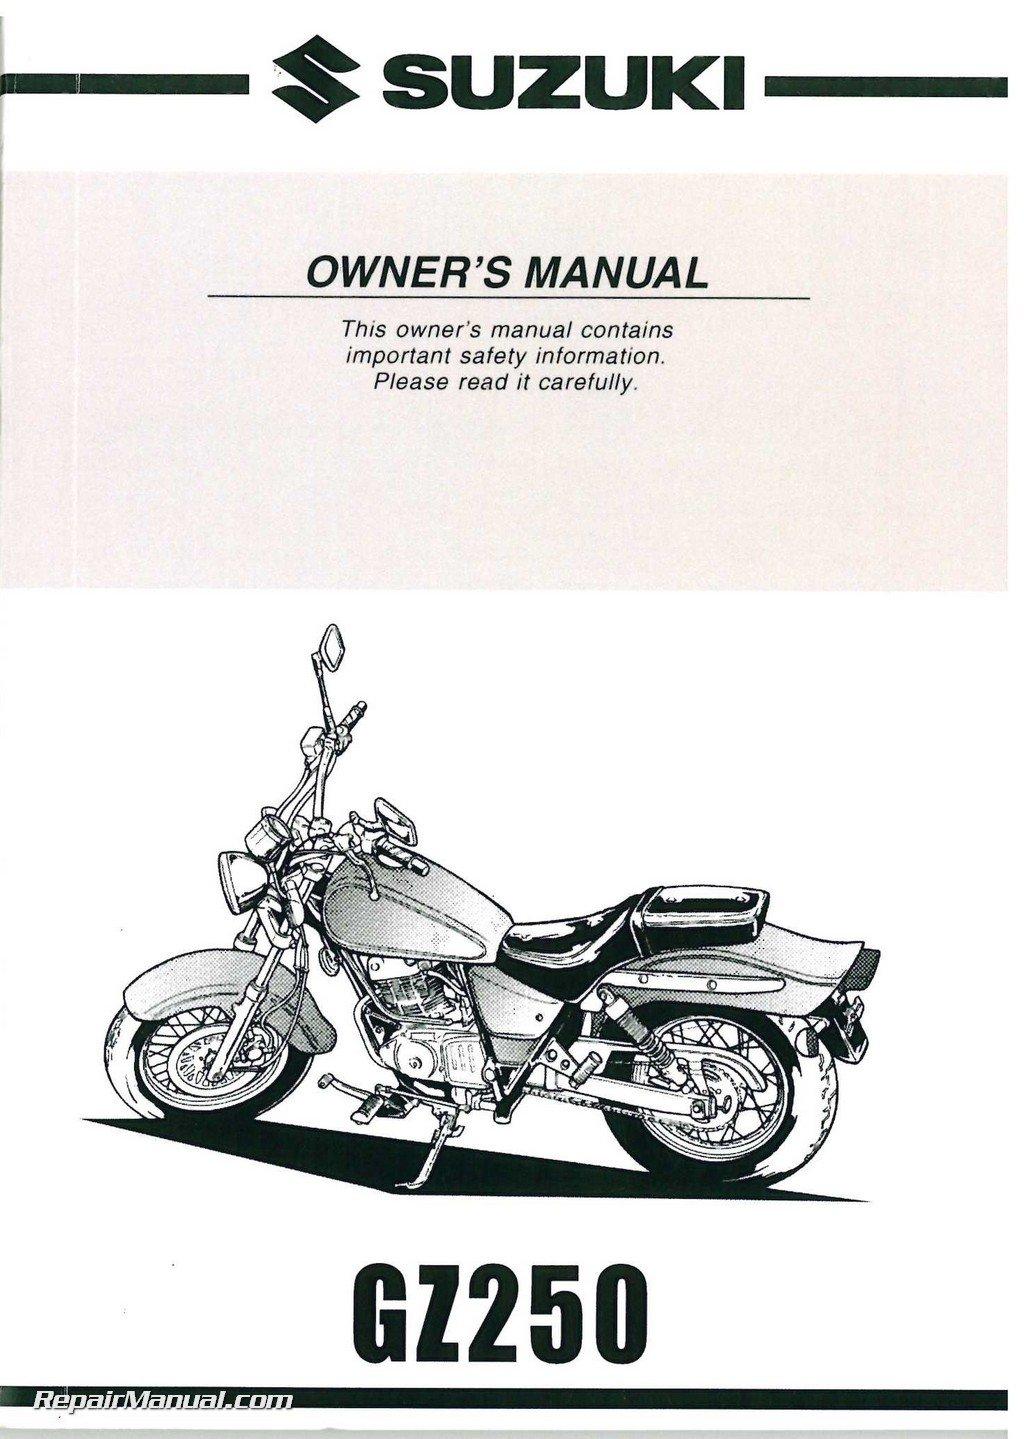 99011-13F51-03A 1999 - 2000 Suzuki GZ250 Marauder Motorcycle Owners Manual:  Manufacturer: Amazon.com: Books